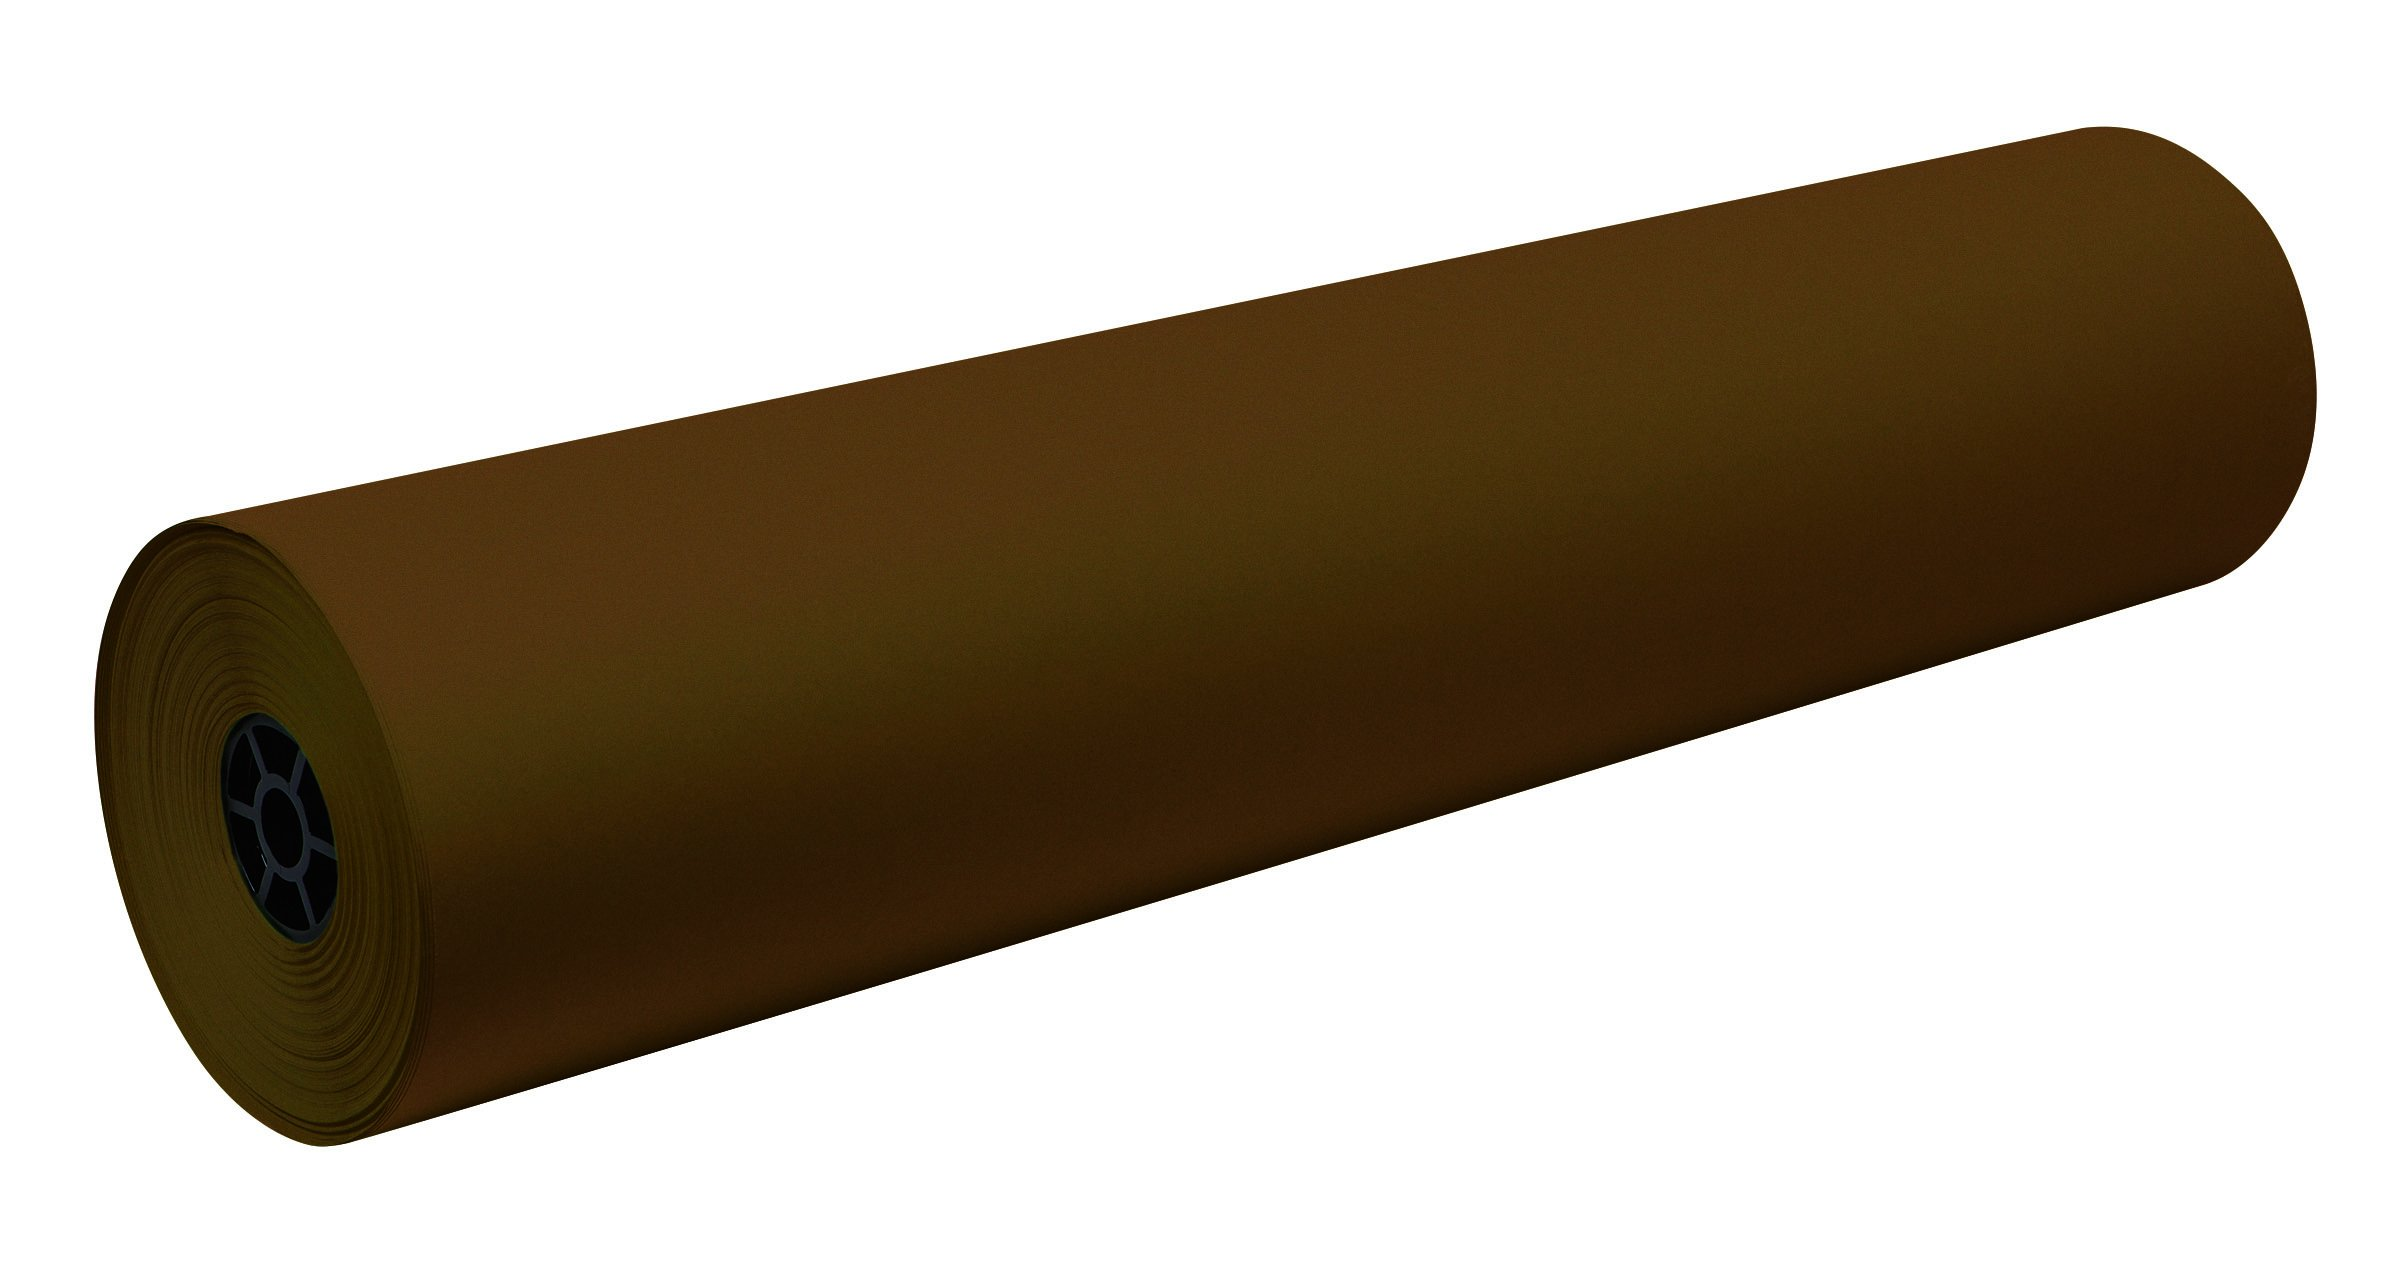 Pacon Decorol Art Paper Roll, 3-Feet by 500-Feet, Dark Brown (100598)